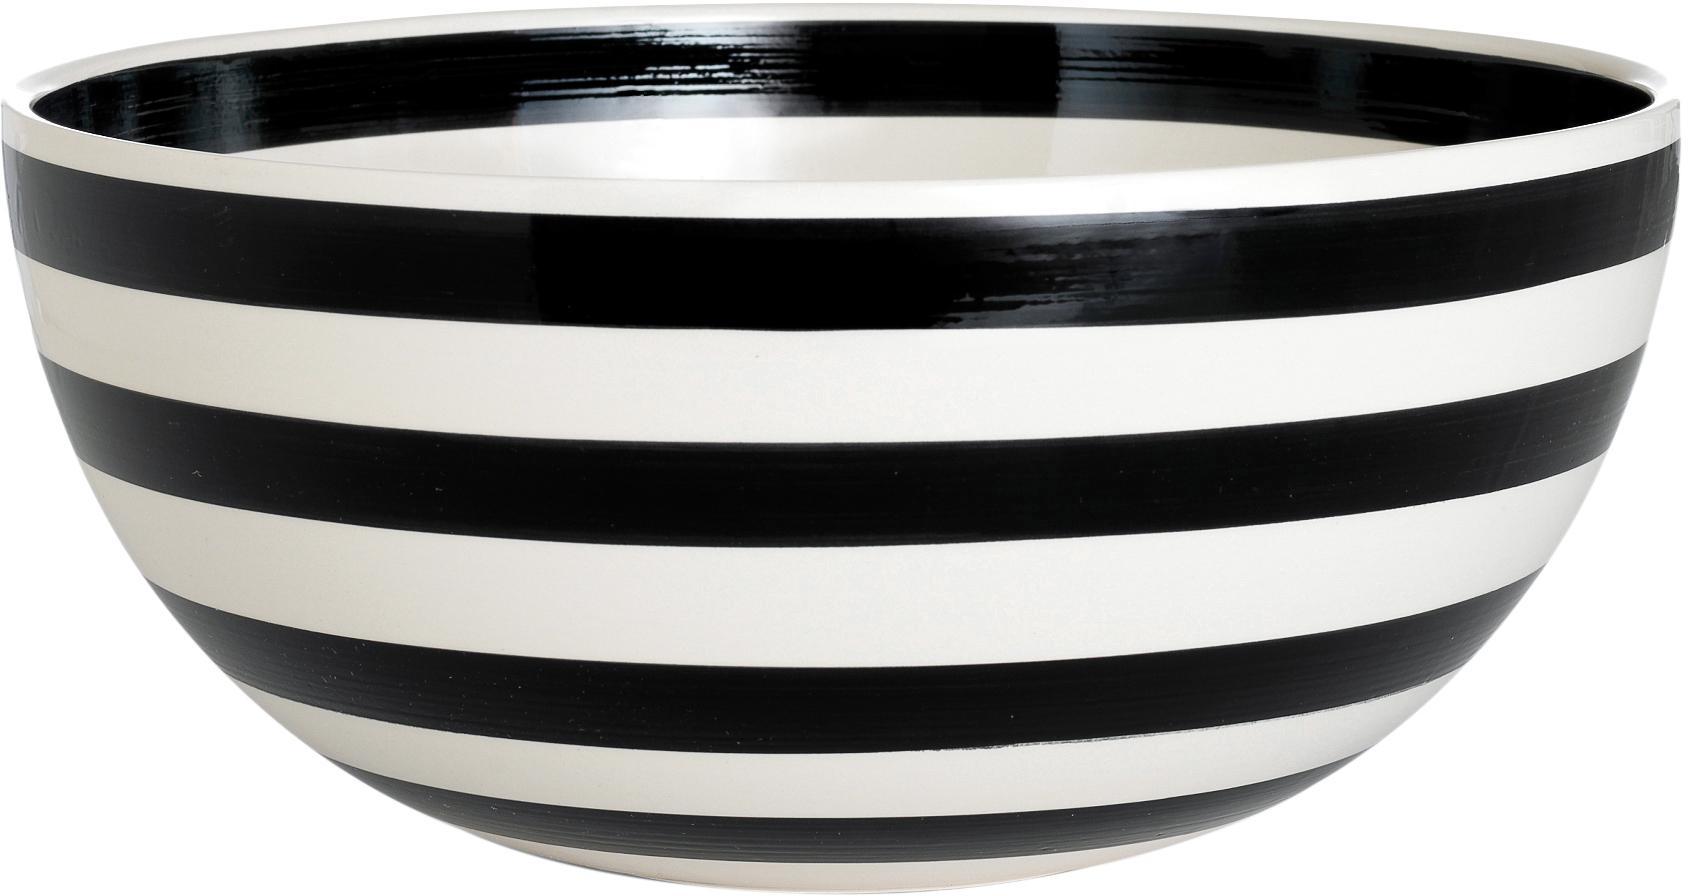 Ciotola centrotavola Omaggio, Ceramica, Nero, bianco, Ø 30 x Alt. 14 cm